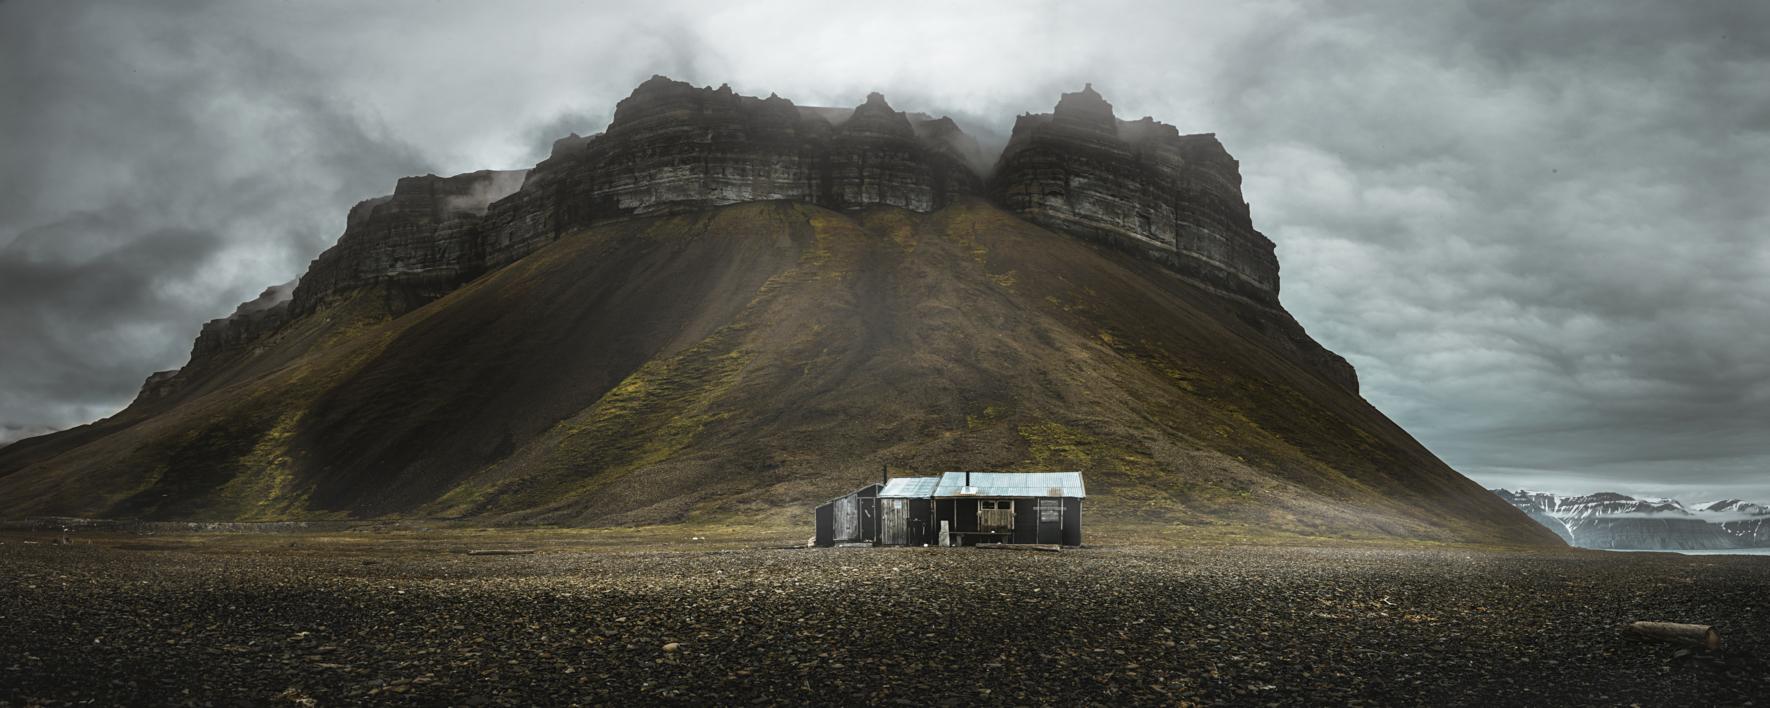 Magdalenefjord |Fotografía de Roberto Iván Cano | Compra arte en Flecha.es